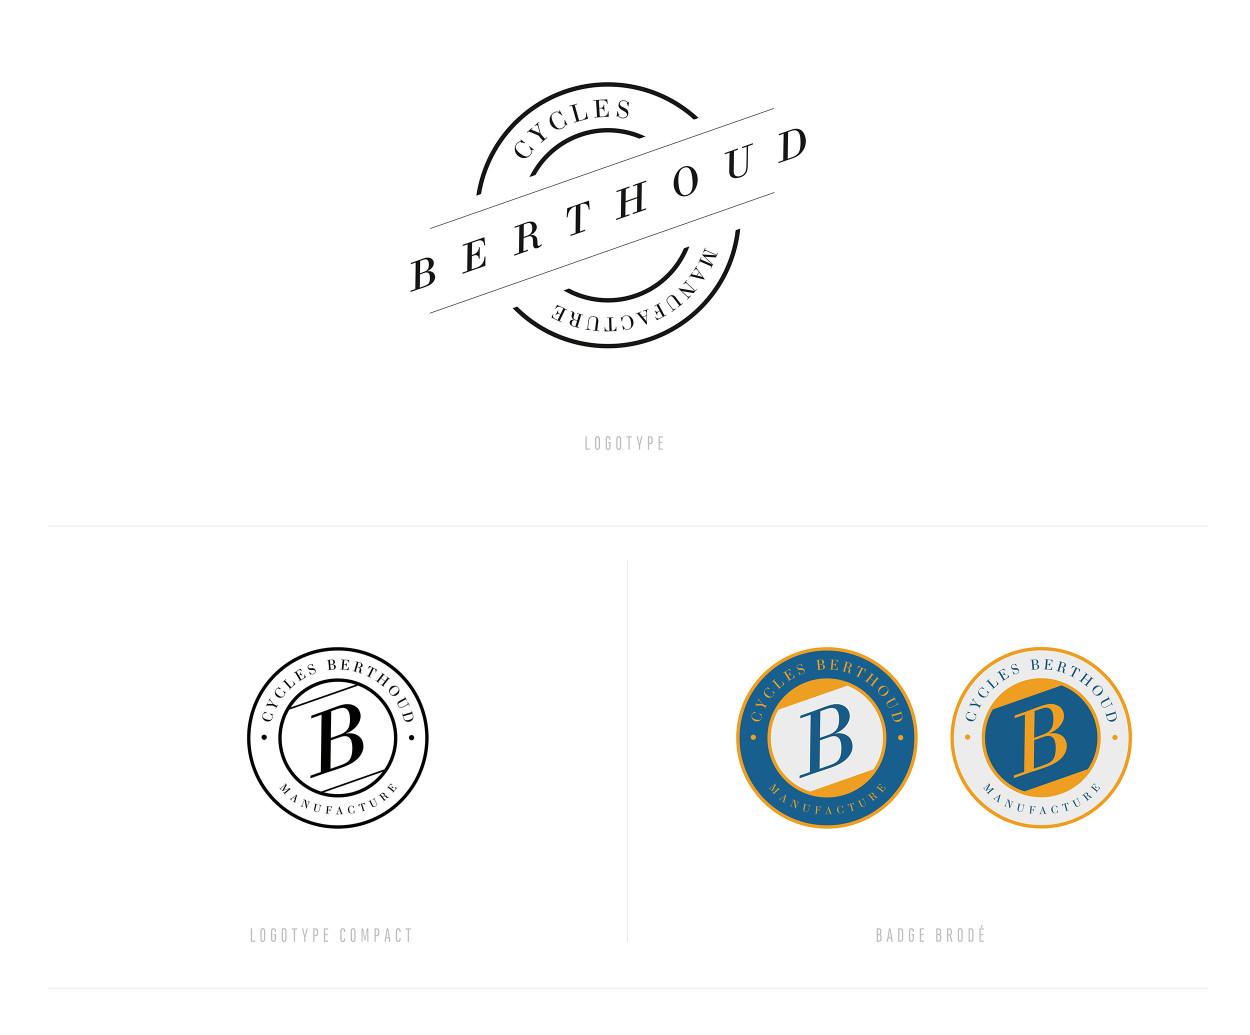 BERTHOUD-01.jpg